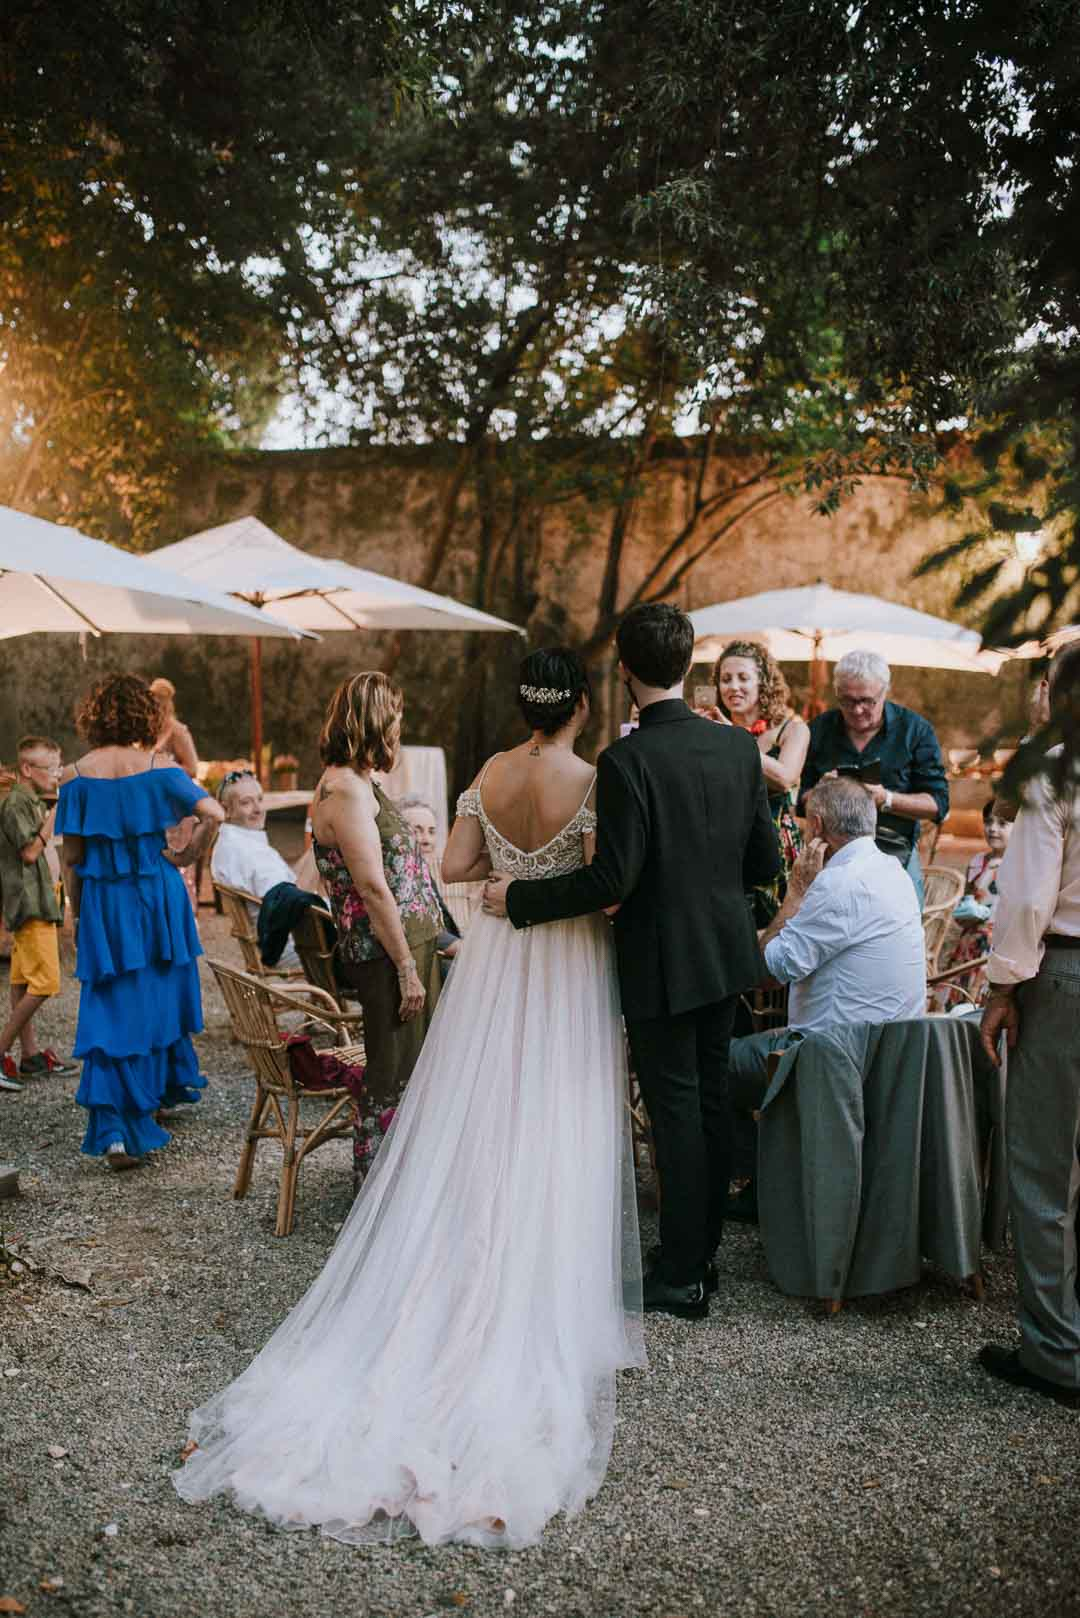 wedding-photographer-destination-fineart-bespoke-reportage-tuscany-villascorzi-vivianeizzo-spazio46-156